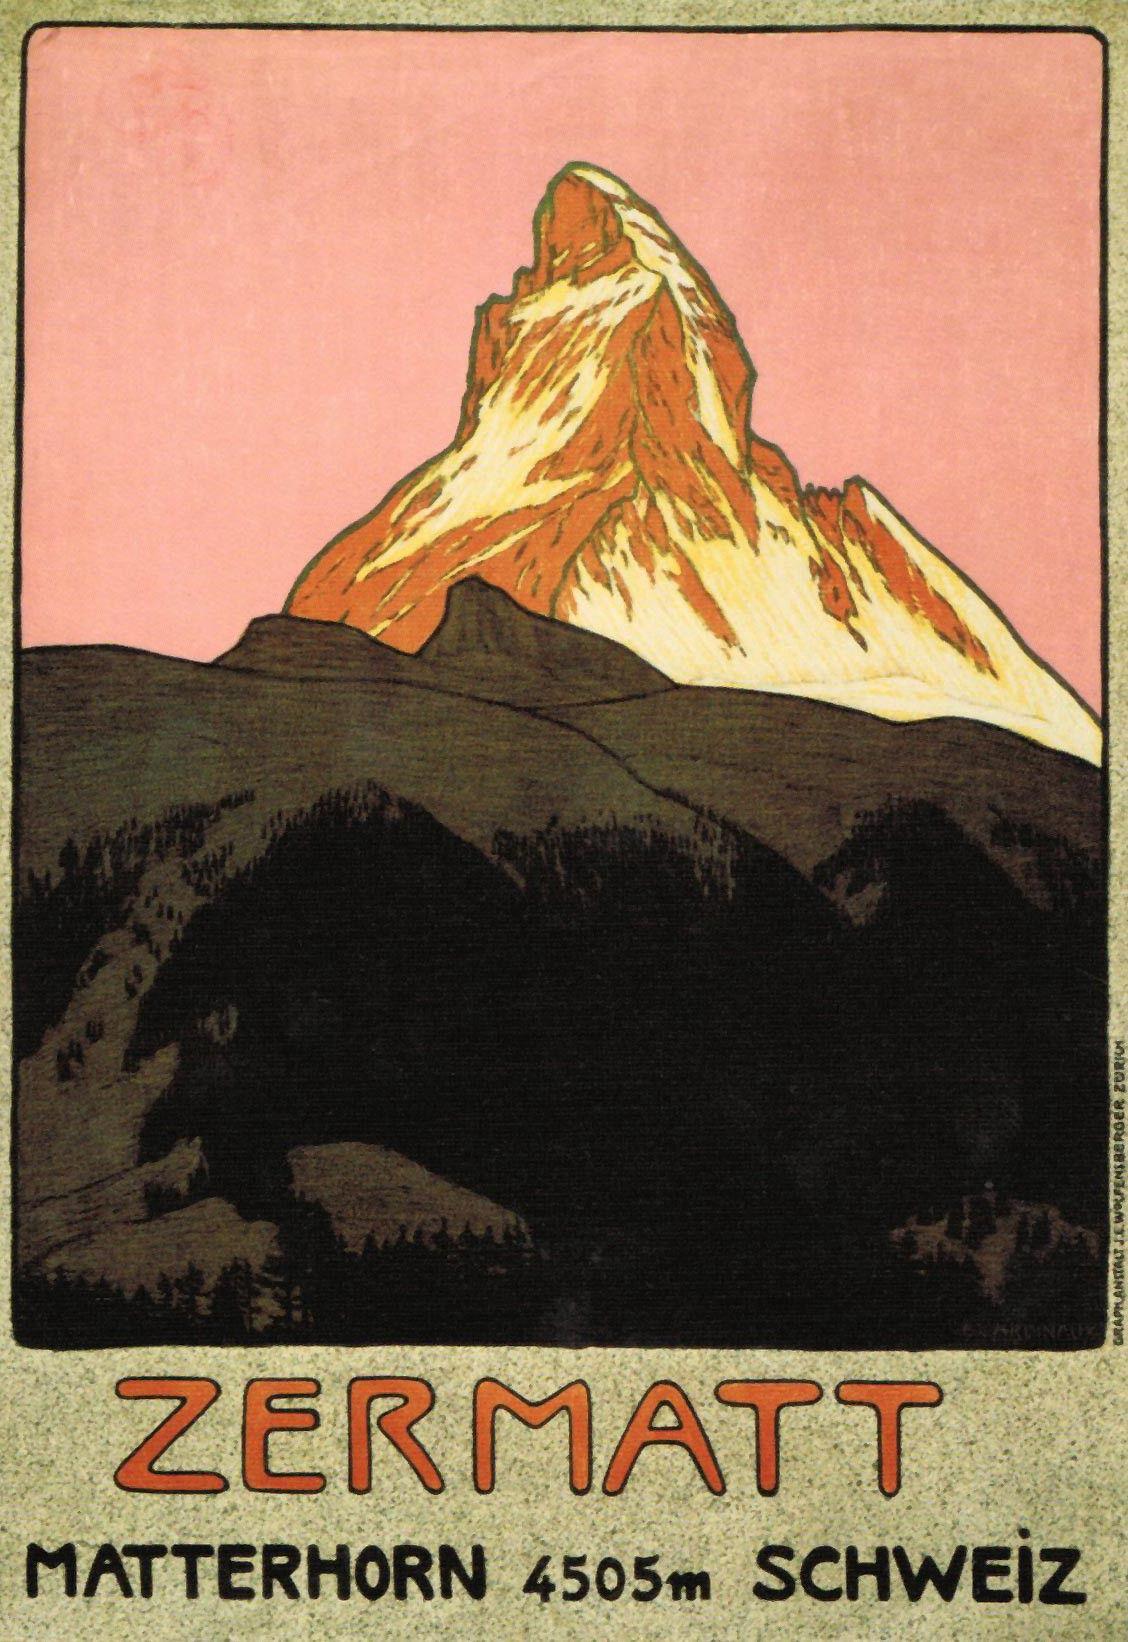 Zermatt Matterhorn By Emil Cardinaux 1908 Ski Posters Vintage Ski Posters Vintage Posters